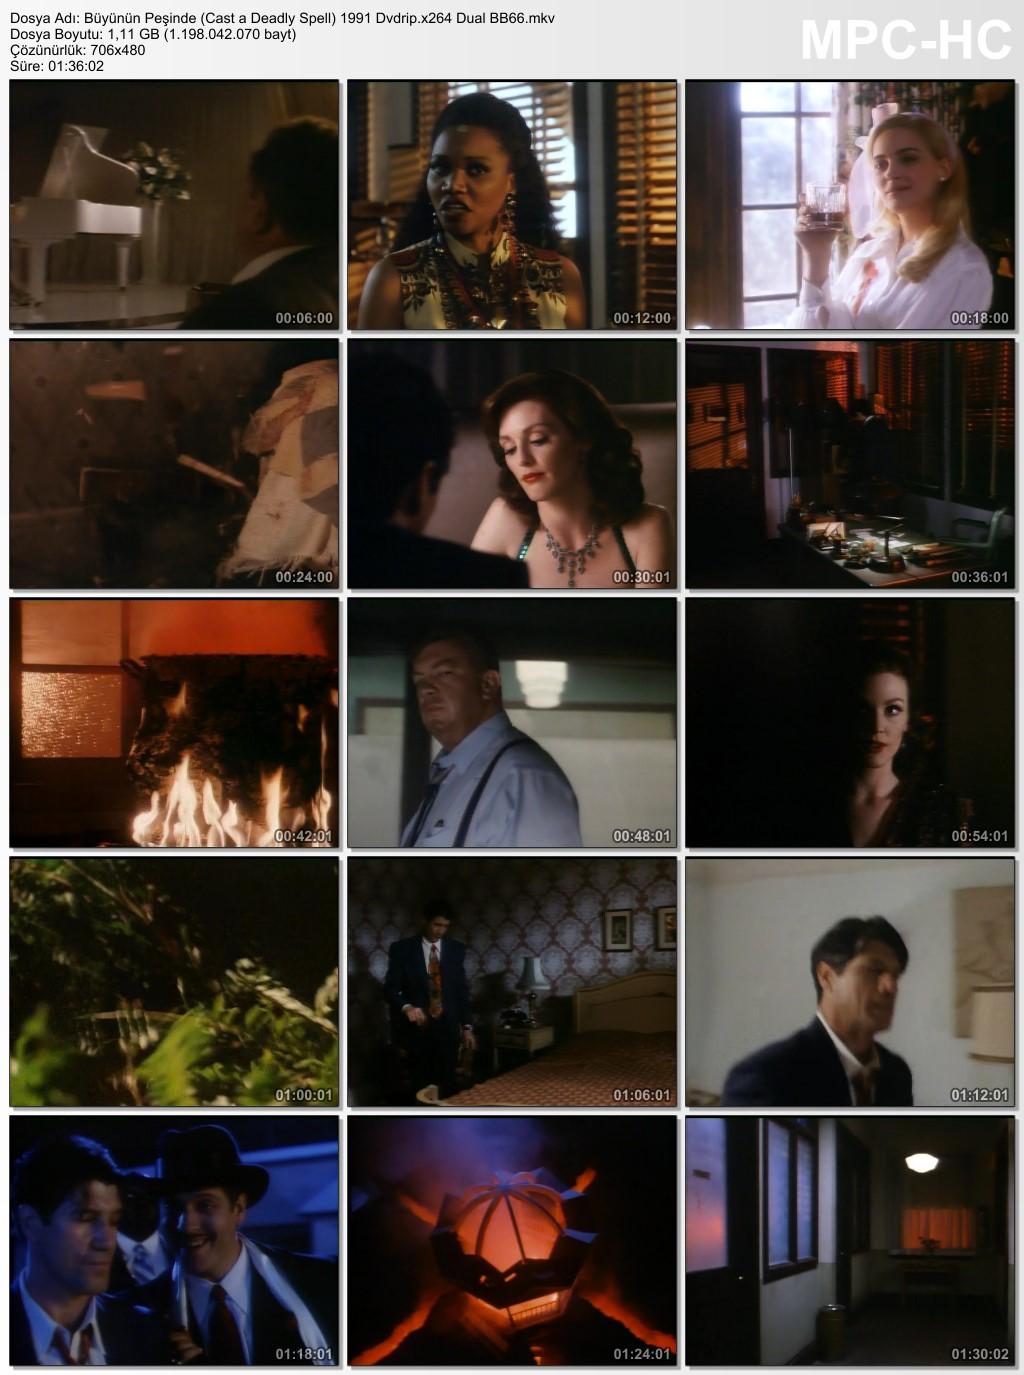 Büyünün Peşinde (Cast a Deadly Spell) 1991 Dvdrip.x264 Dual Türkce Dublaj BB66 (1) - barbarus